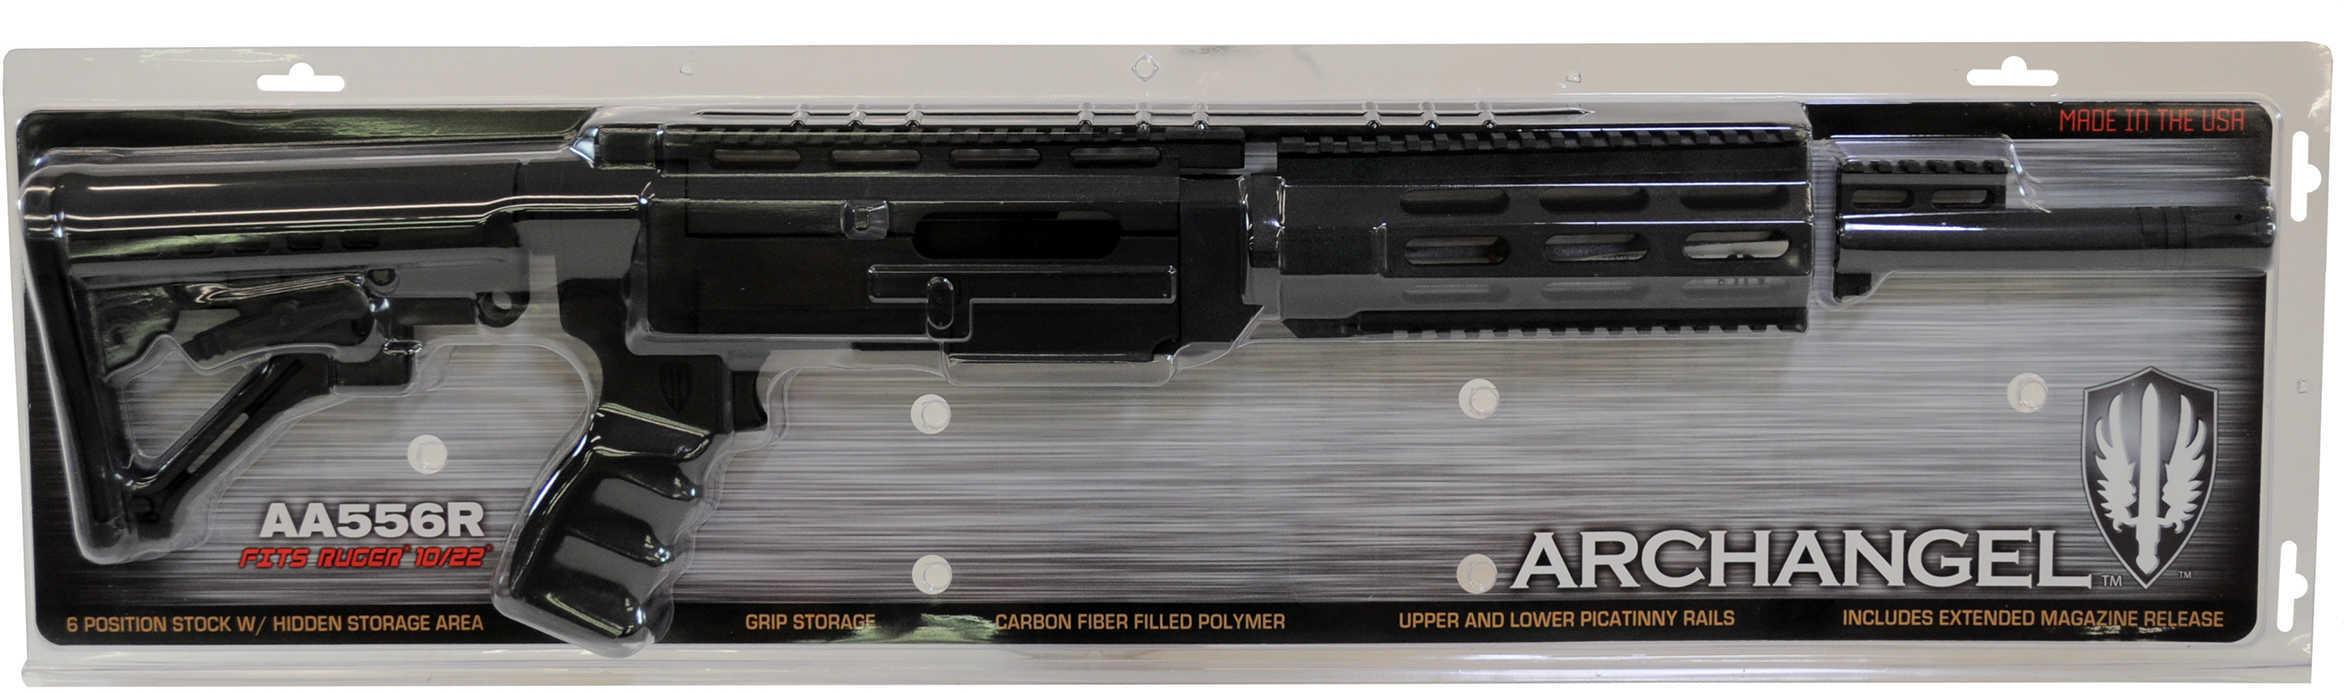 Archangel Ruger® 10/22® Conversion Stock Black, No Bayonet Md: AA556R-Nb